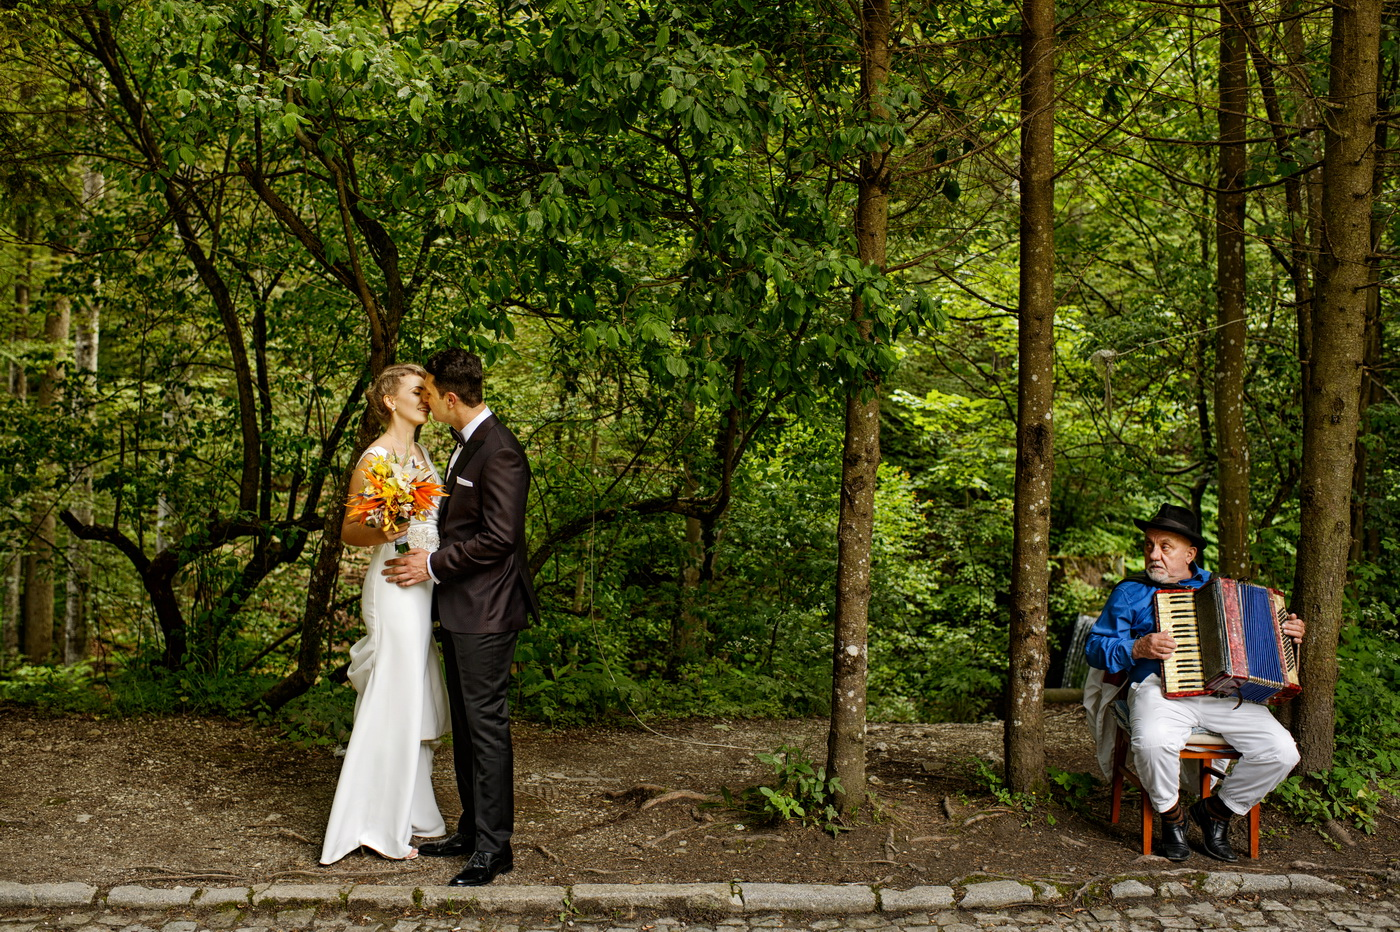 Destination Wedding Photographer_Marian Sterea_197.jpg